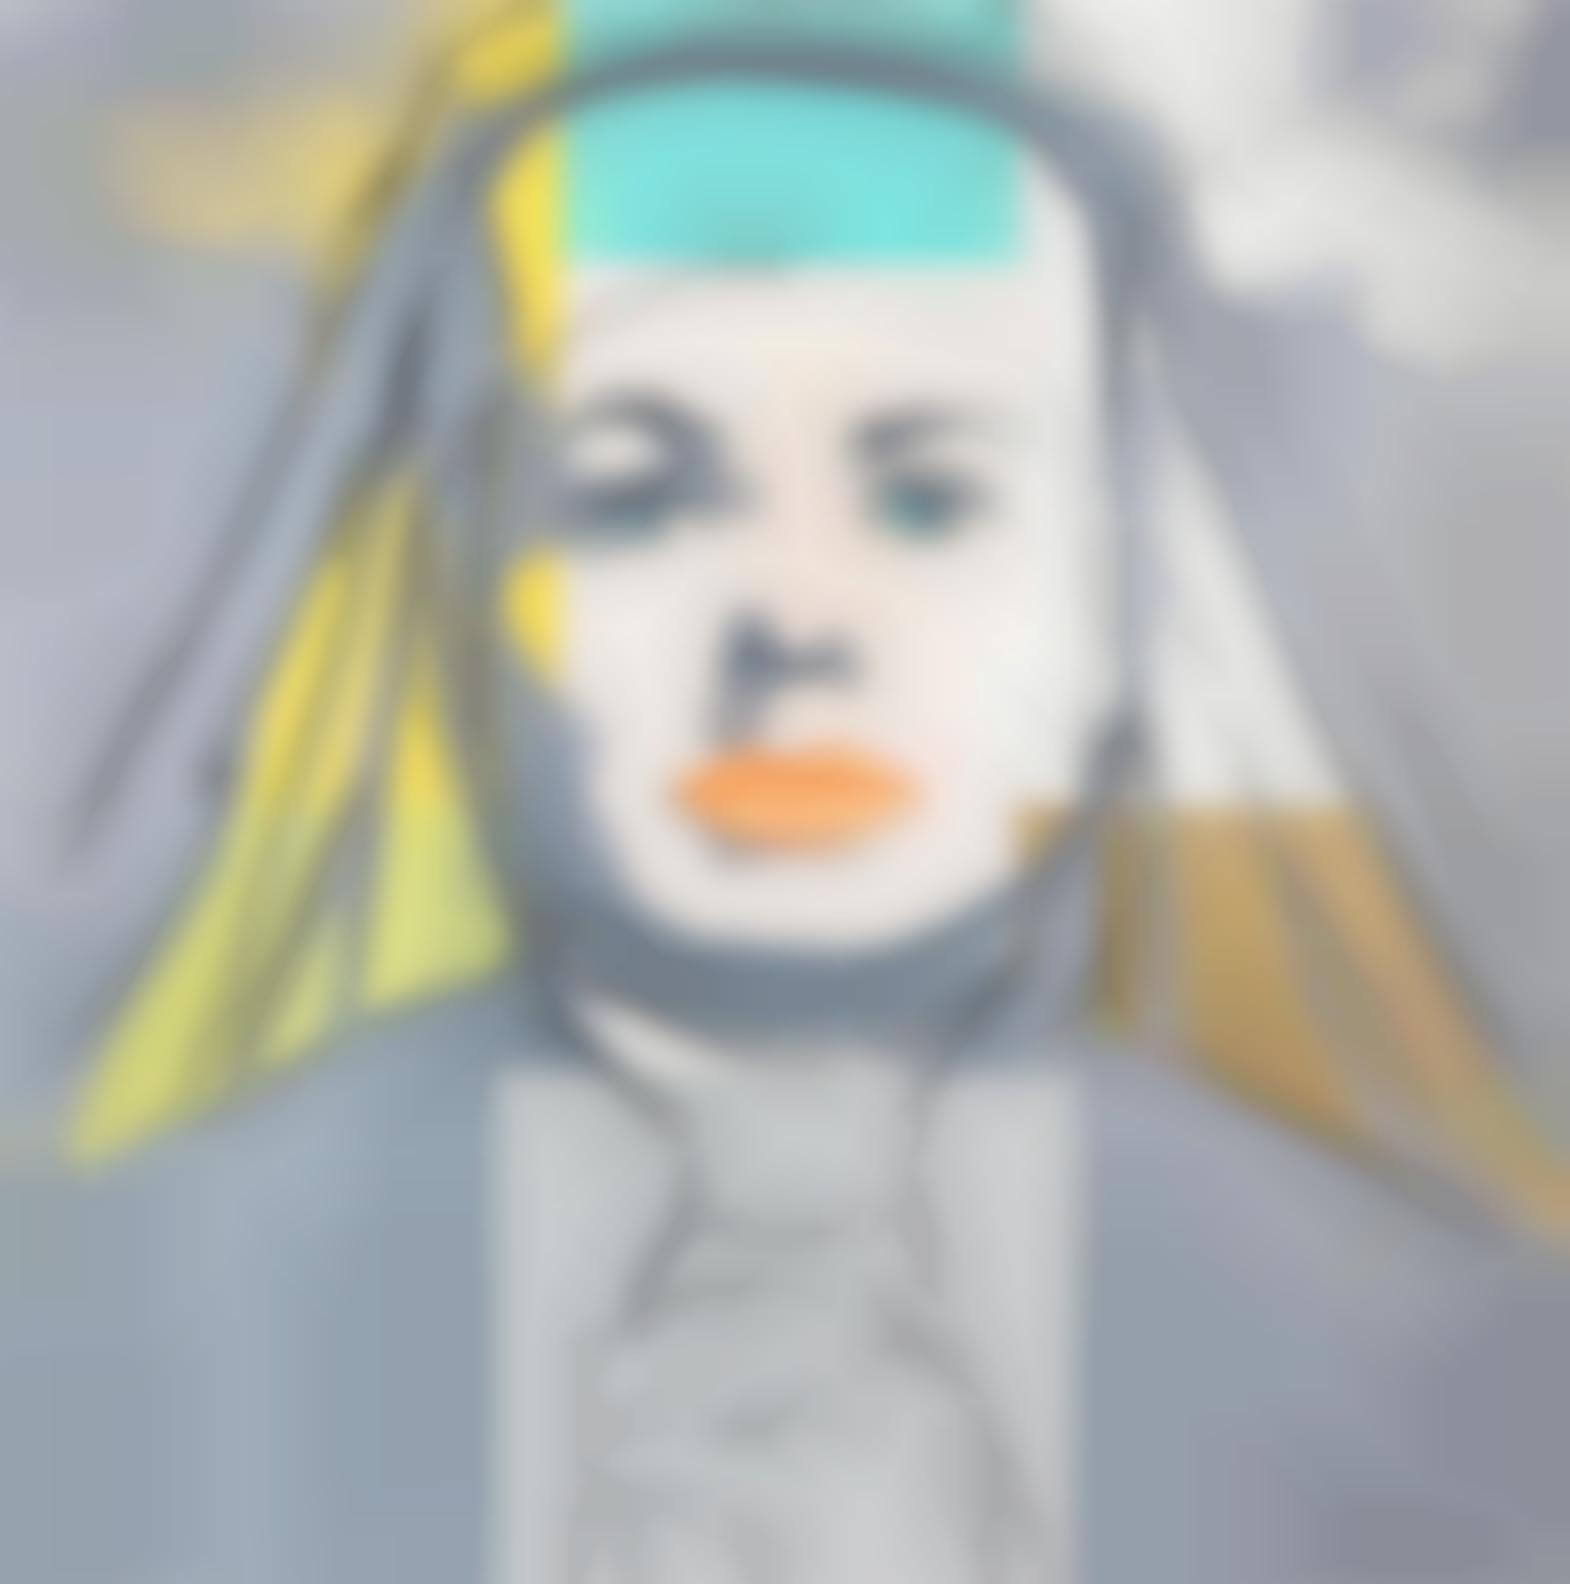 Andy Warhol-The Nun, From Ingrid Bergman (Feldman & Schellmann IIb.314)-1983